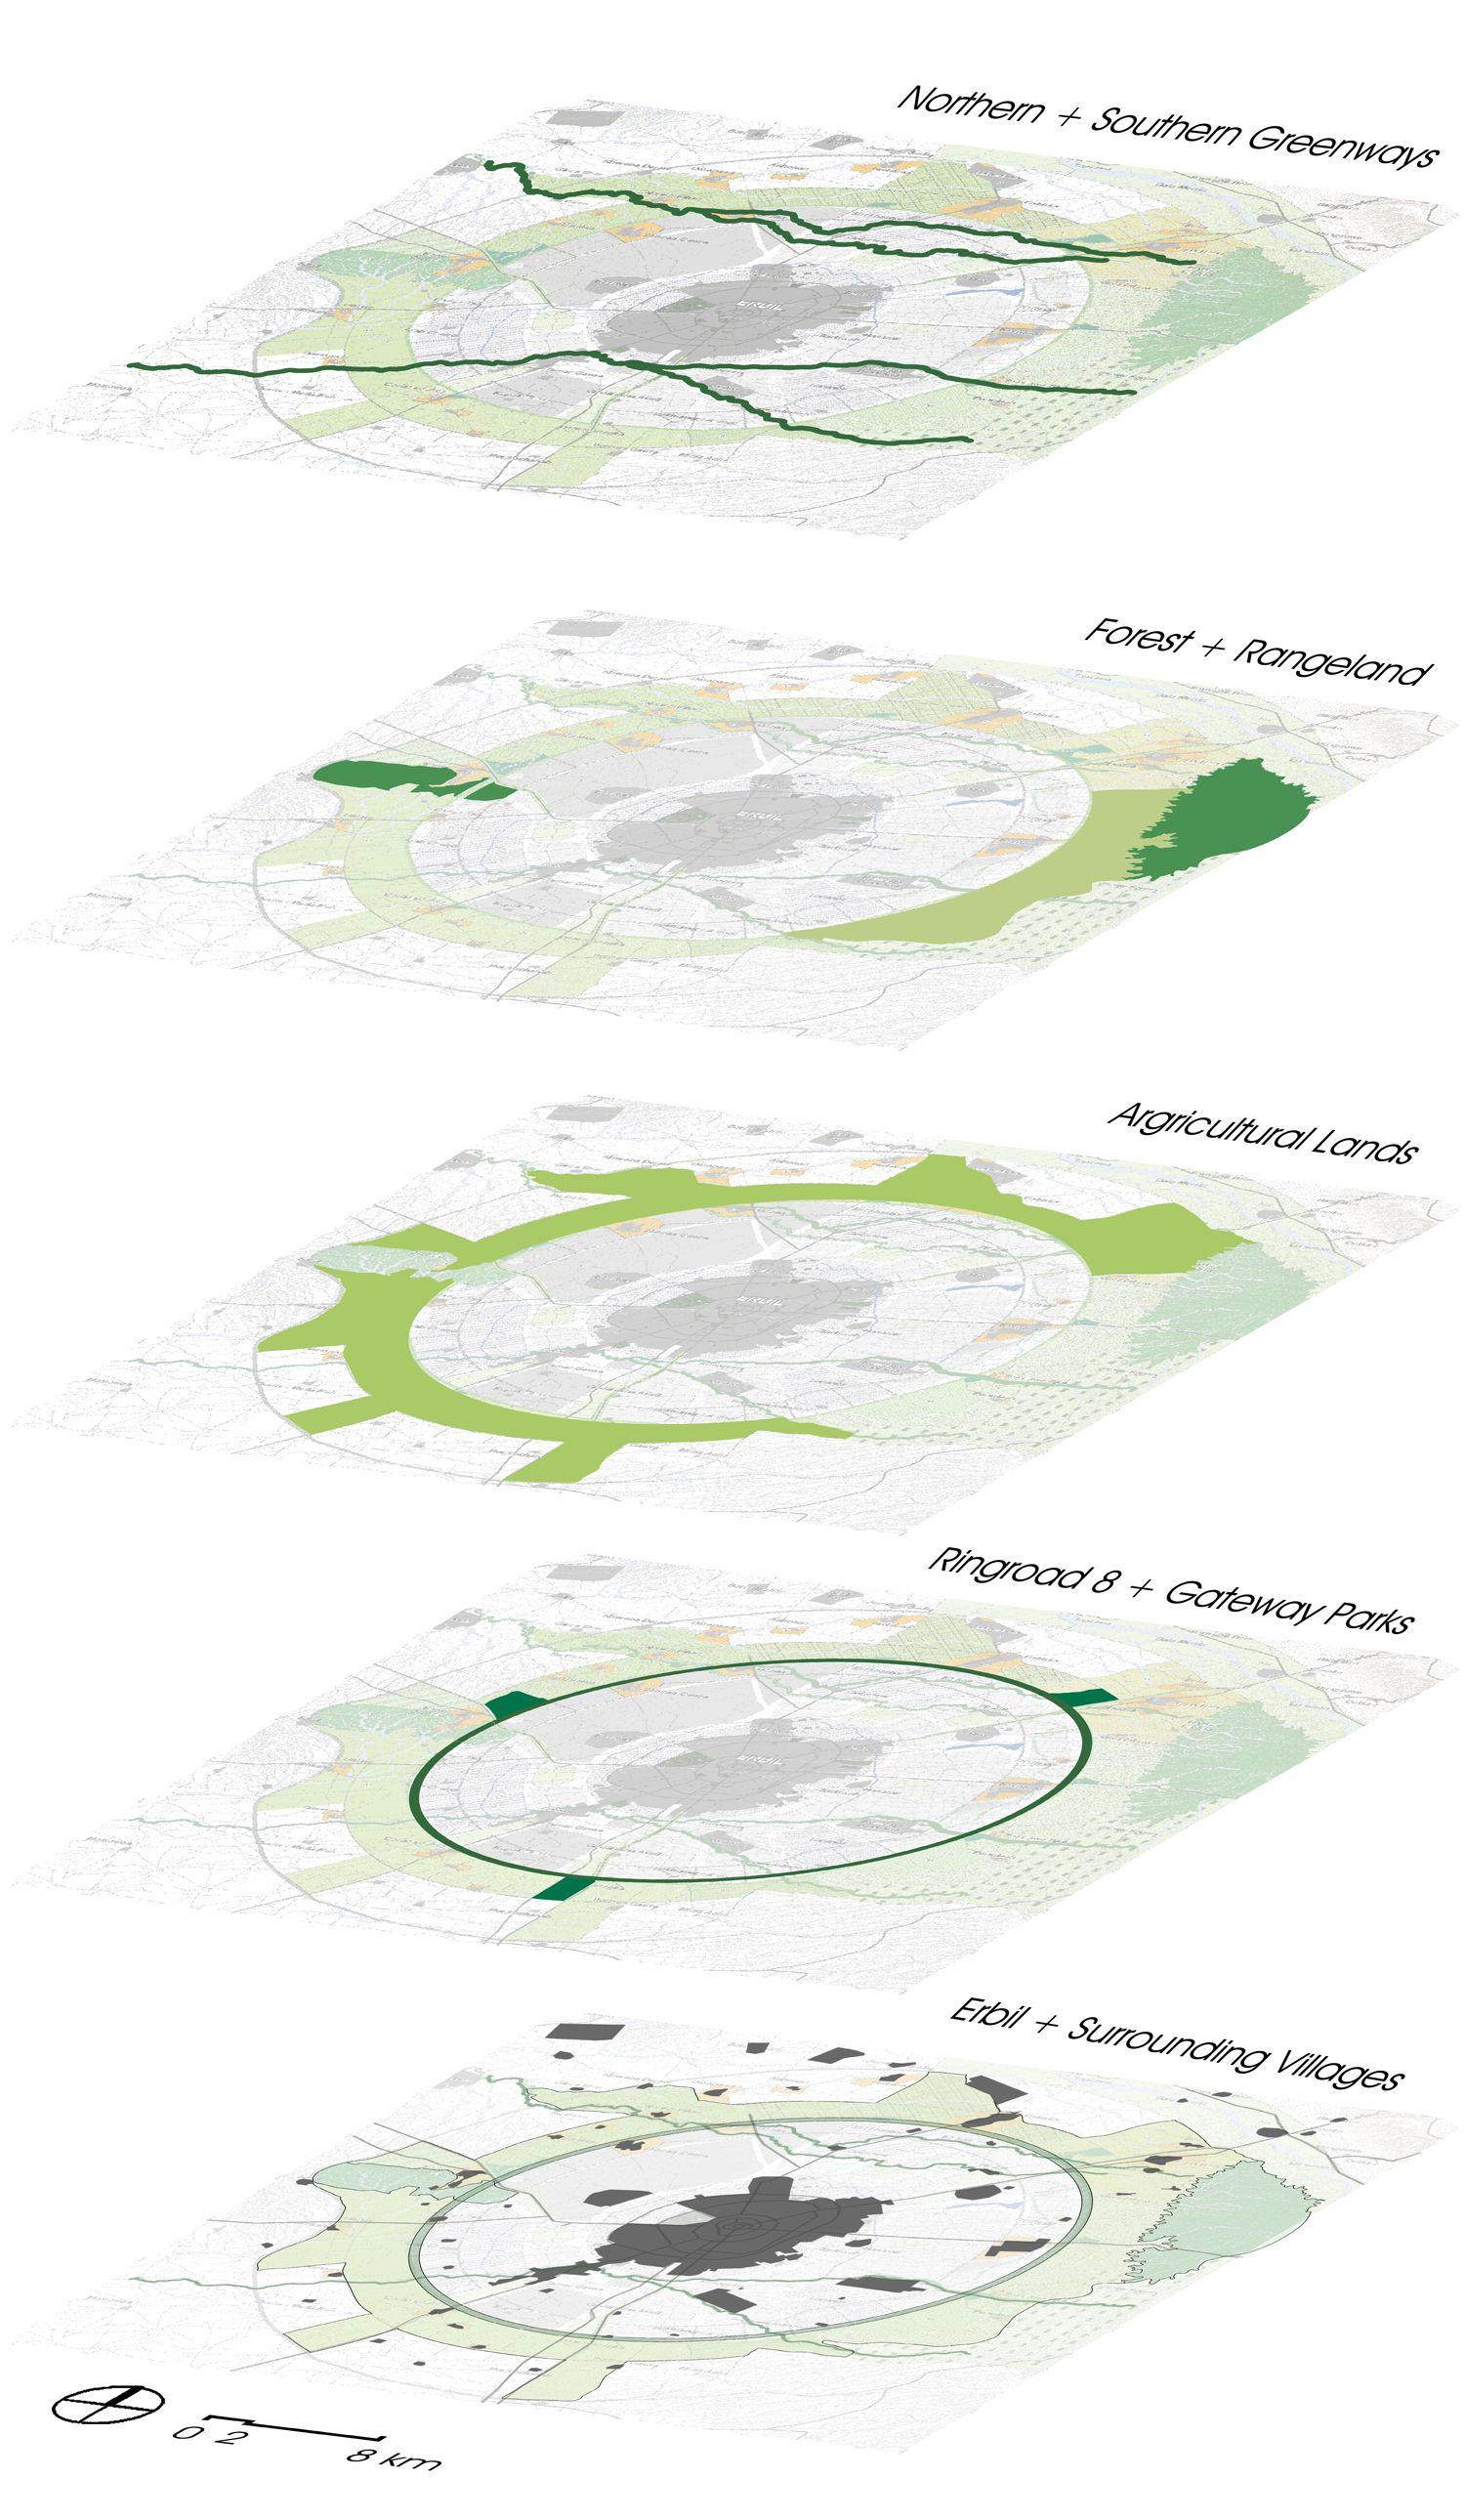 Park circulation design google search park design pinterest park circulation design google search publicscrutiny Images